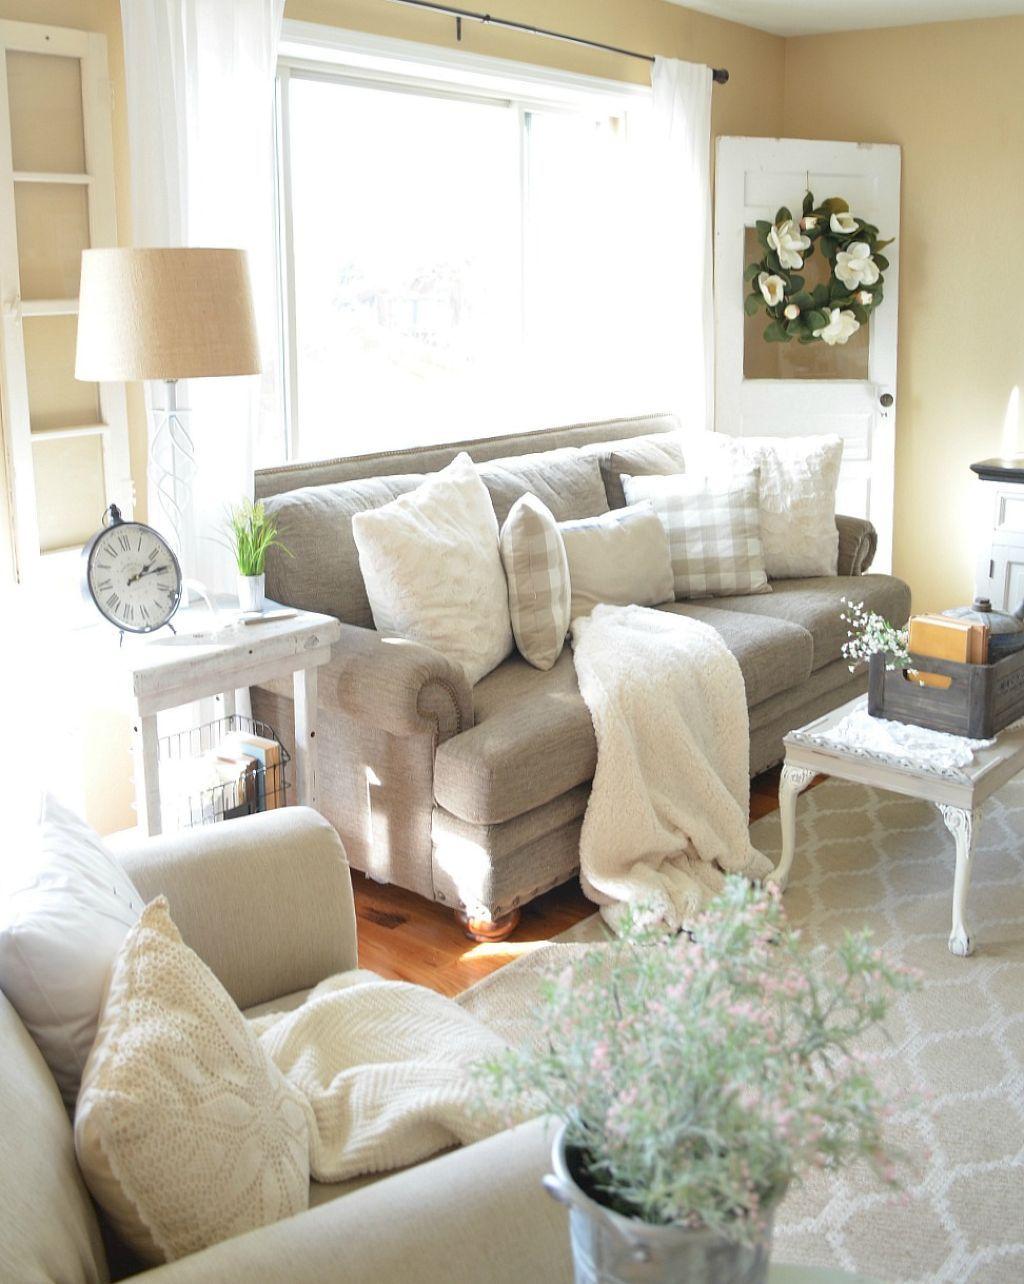 35 Awesome Modern Farmhouse Living Room Decor